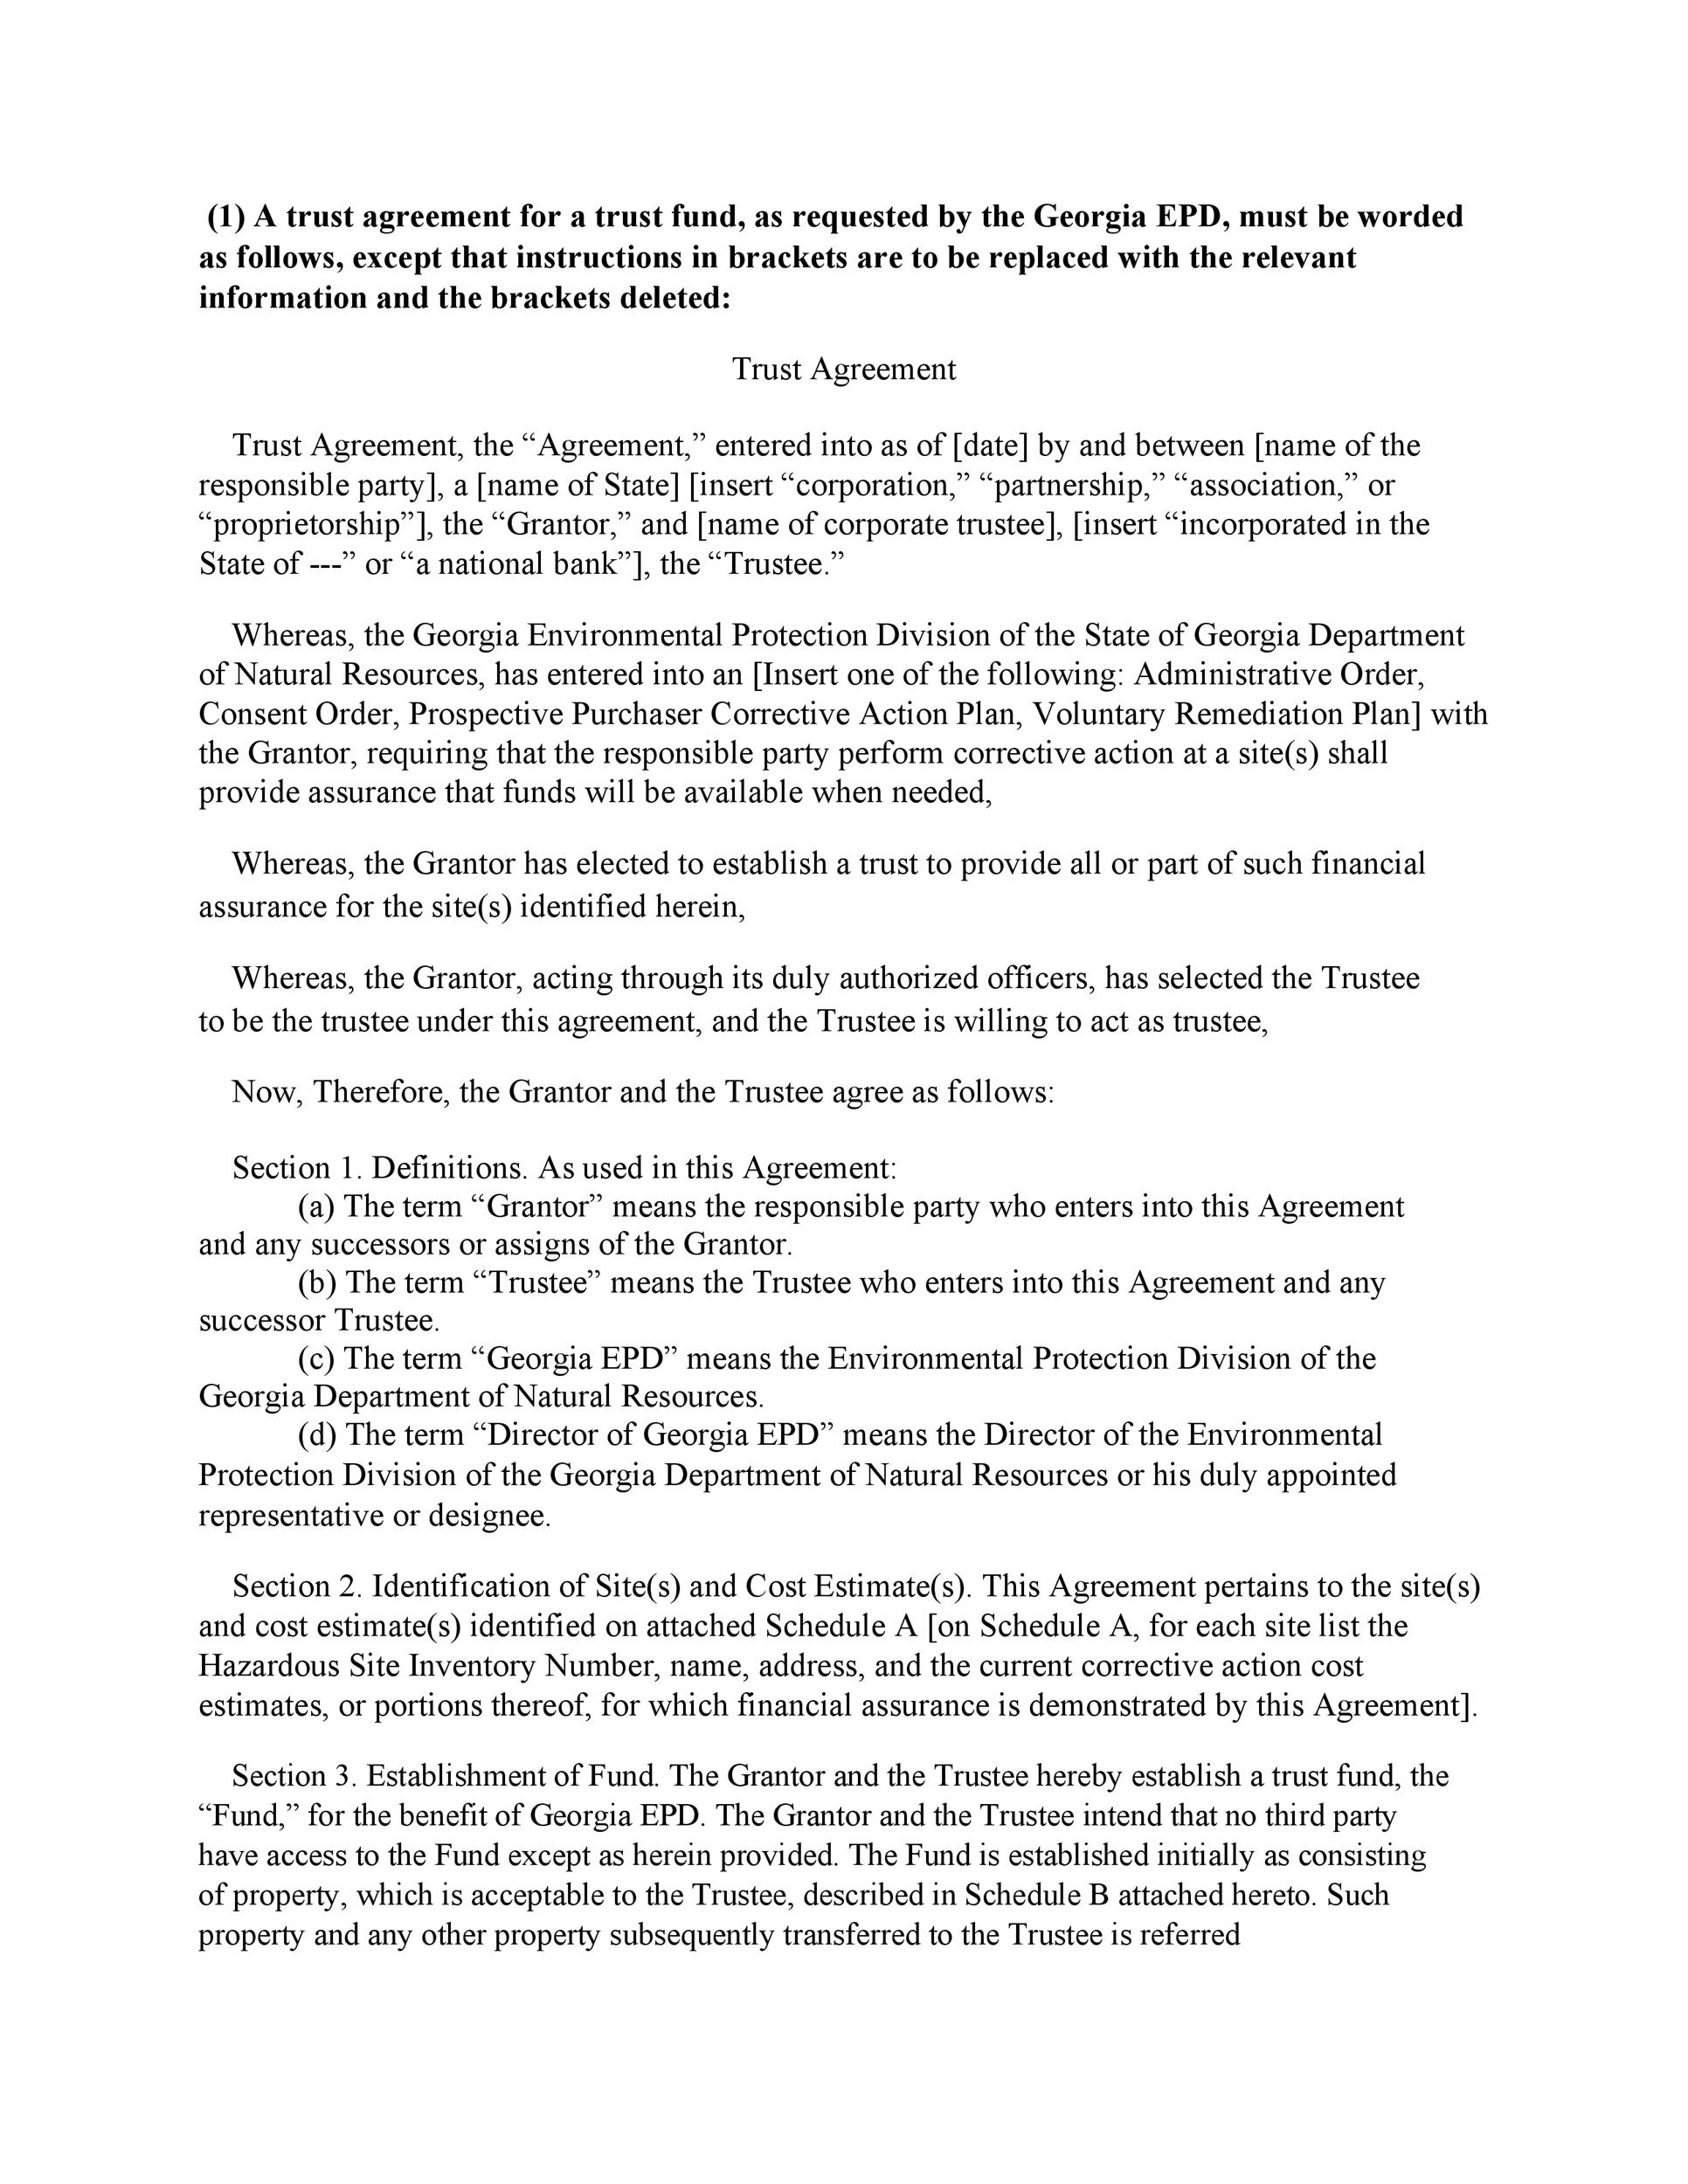 Free trust agreement 23